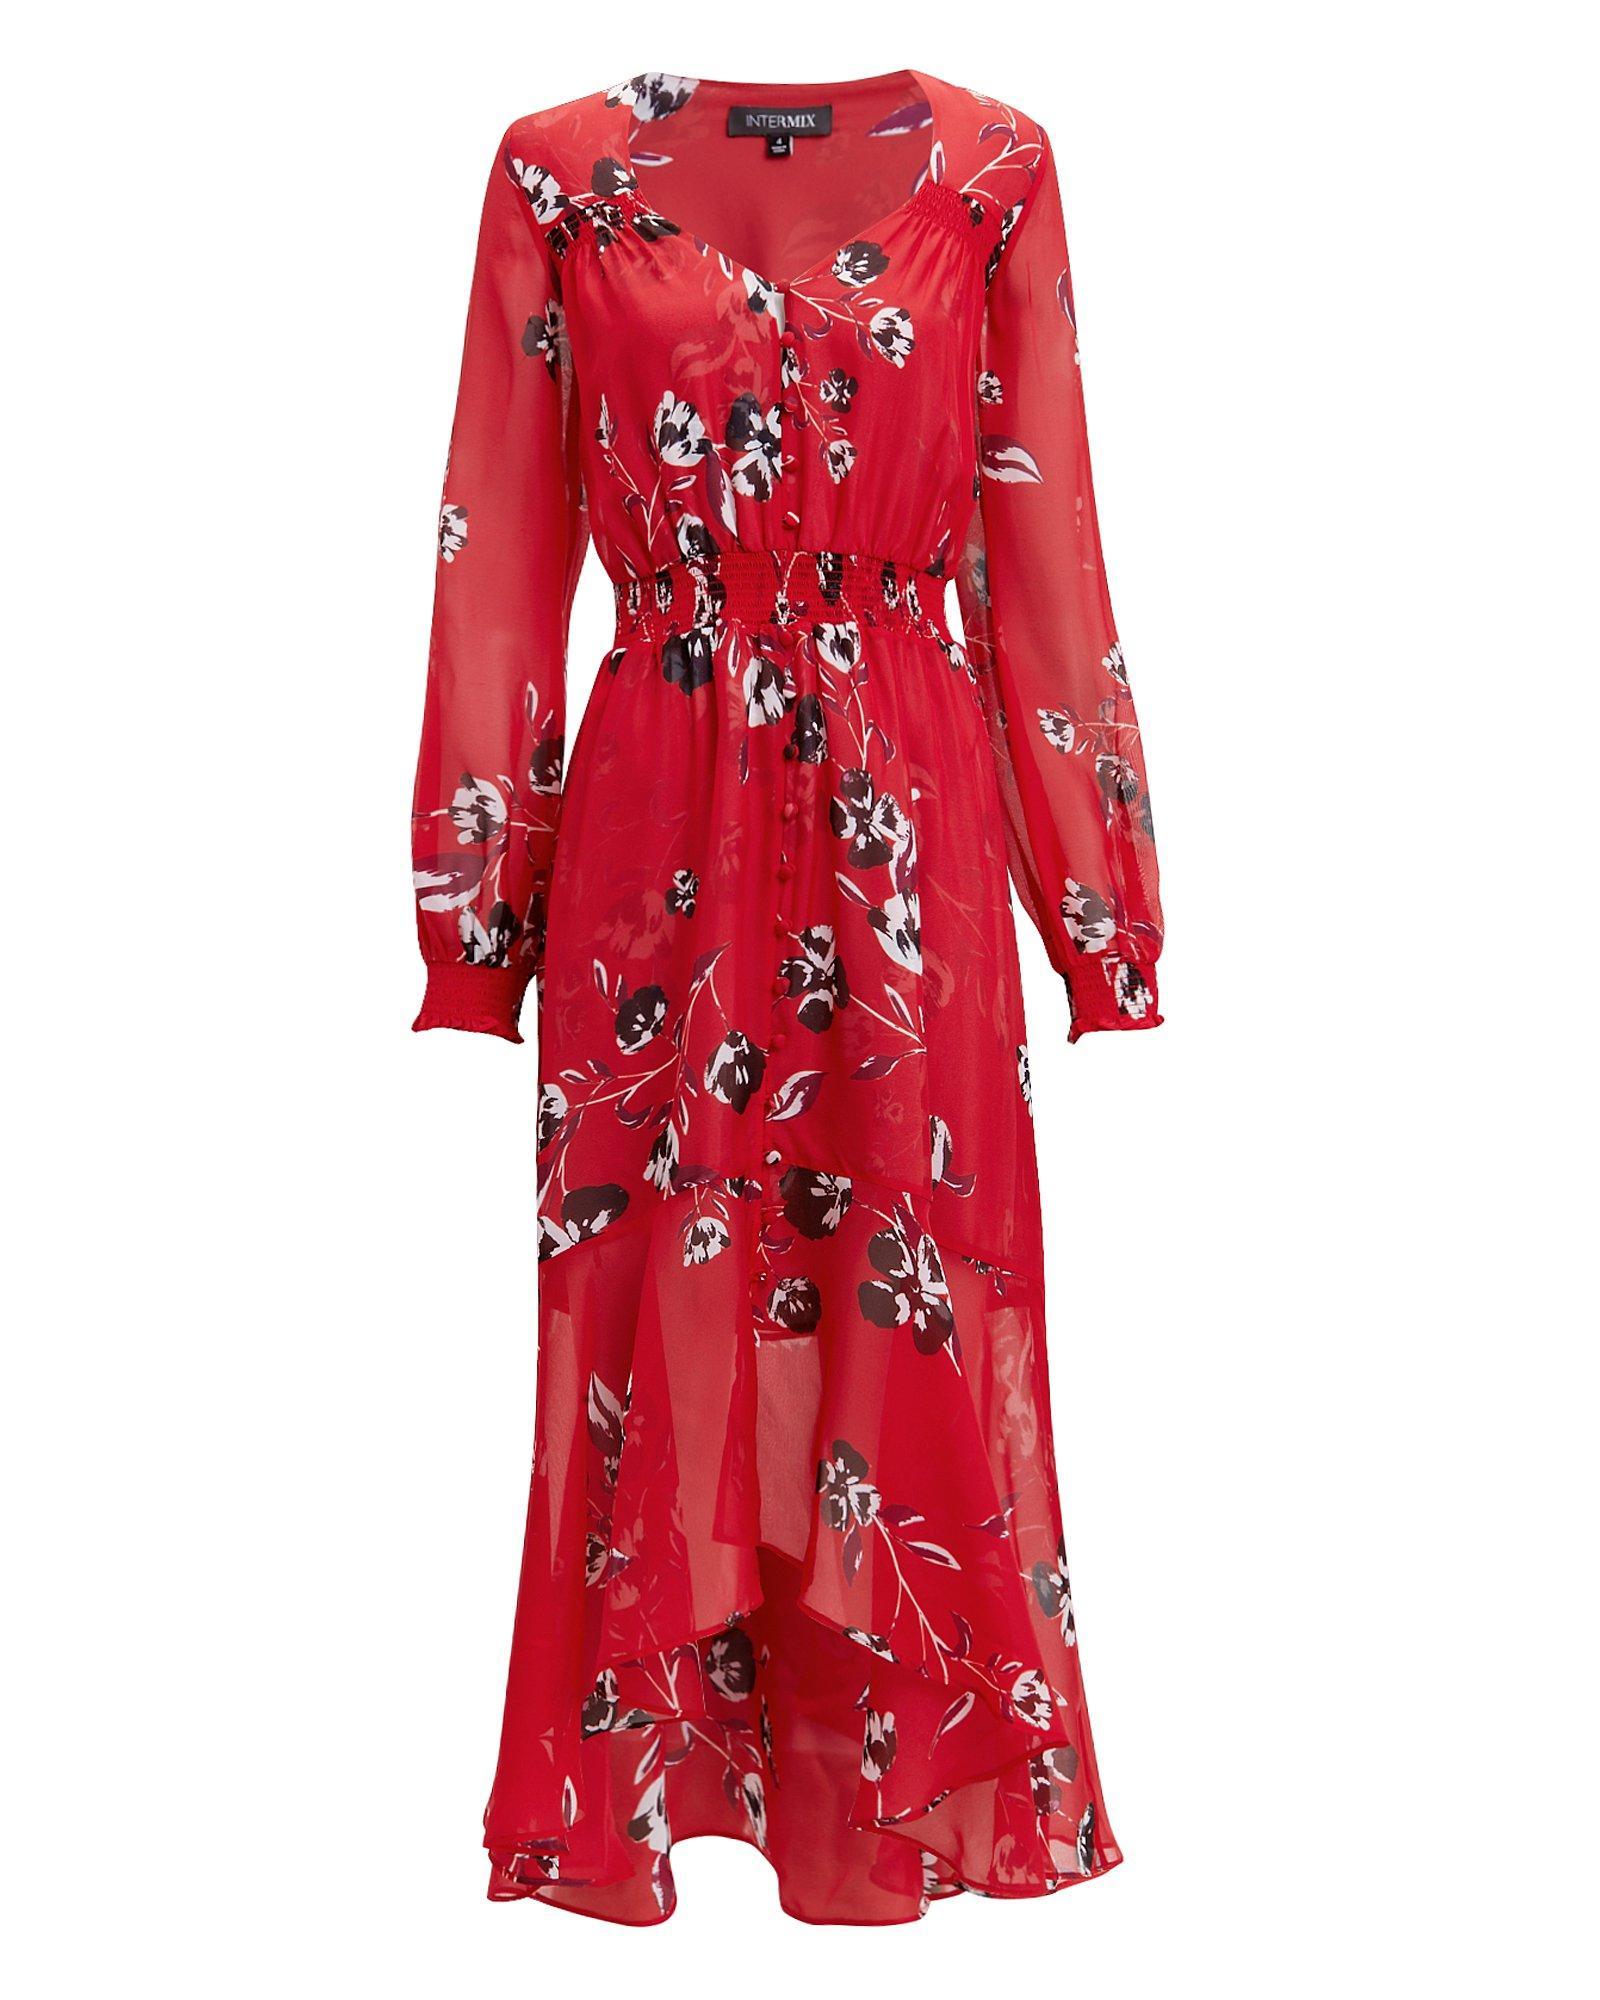 Exclusive For Intermix Deirdre Floral Print Dress